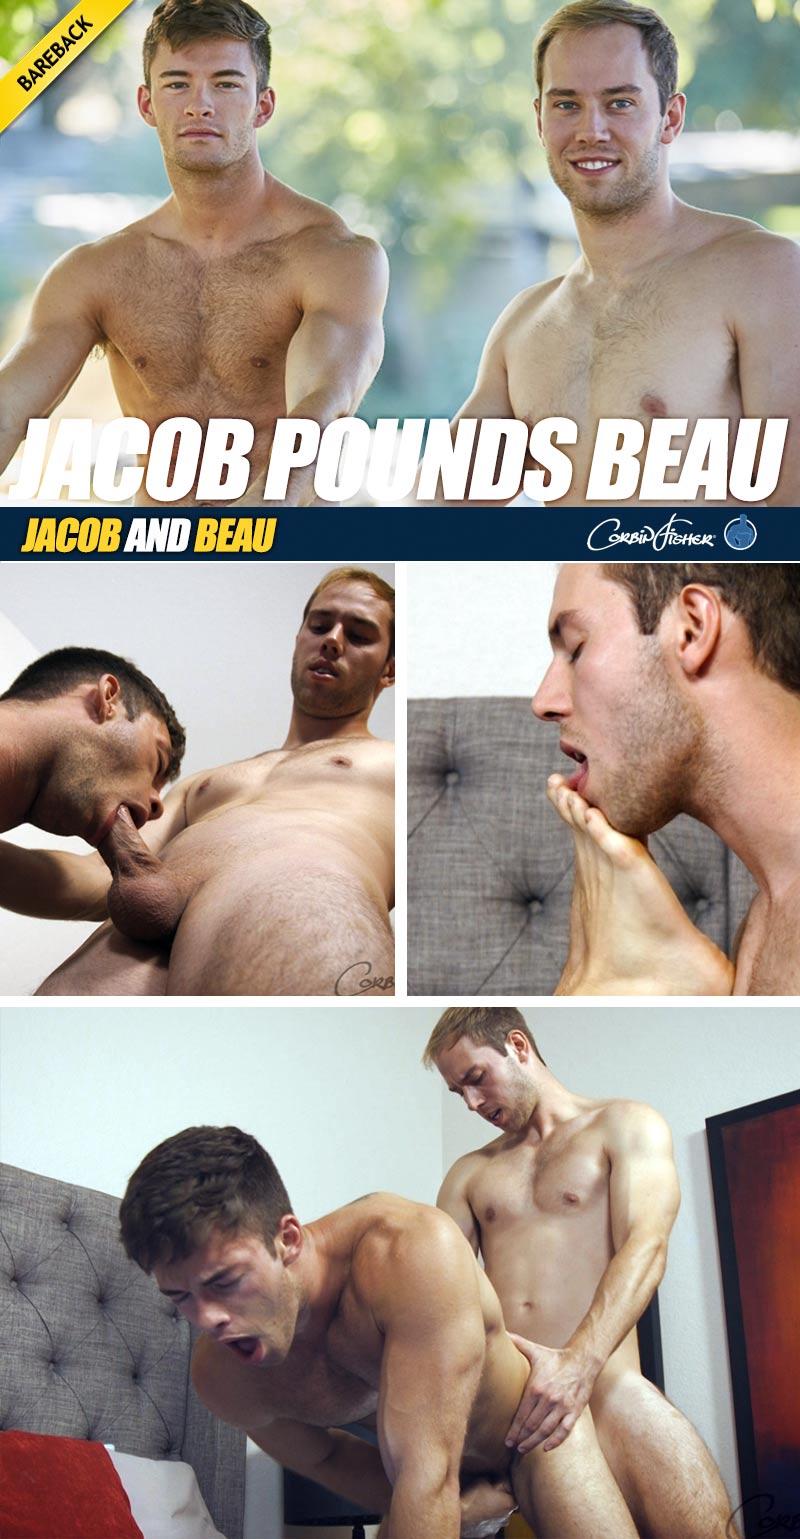 Jacob Pounds Beau (Bareback) at CorbinFisher